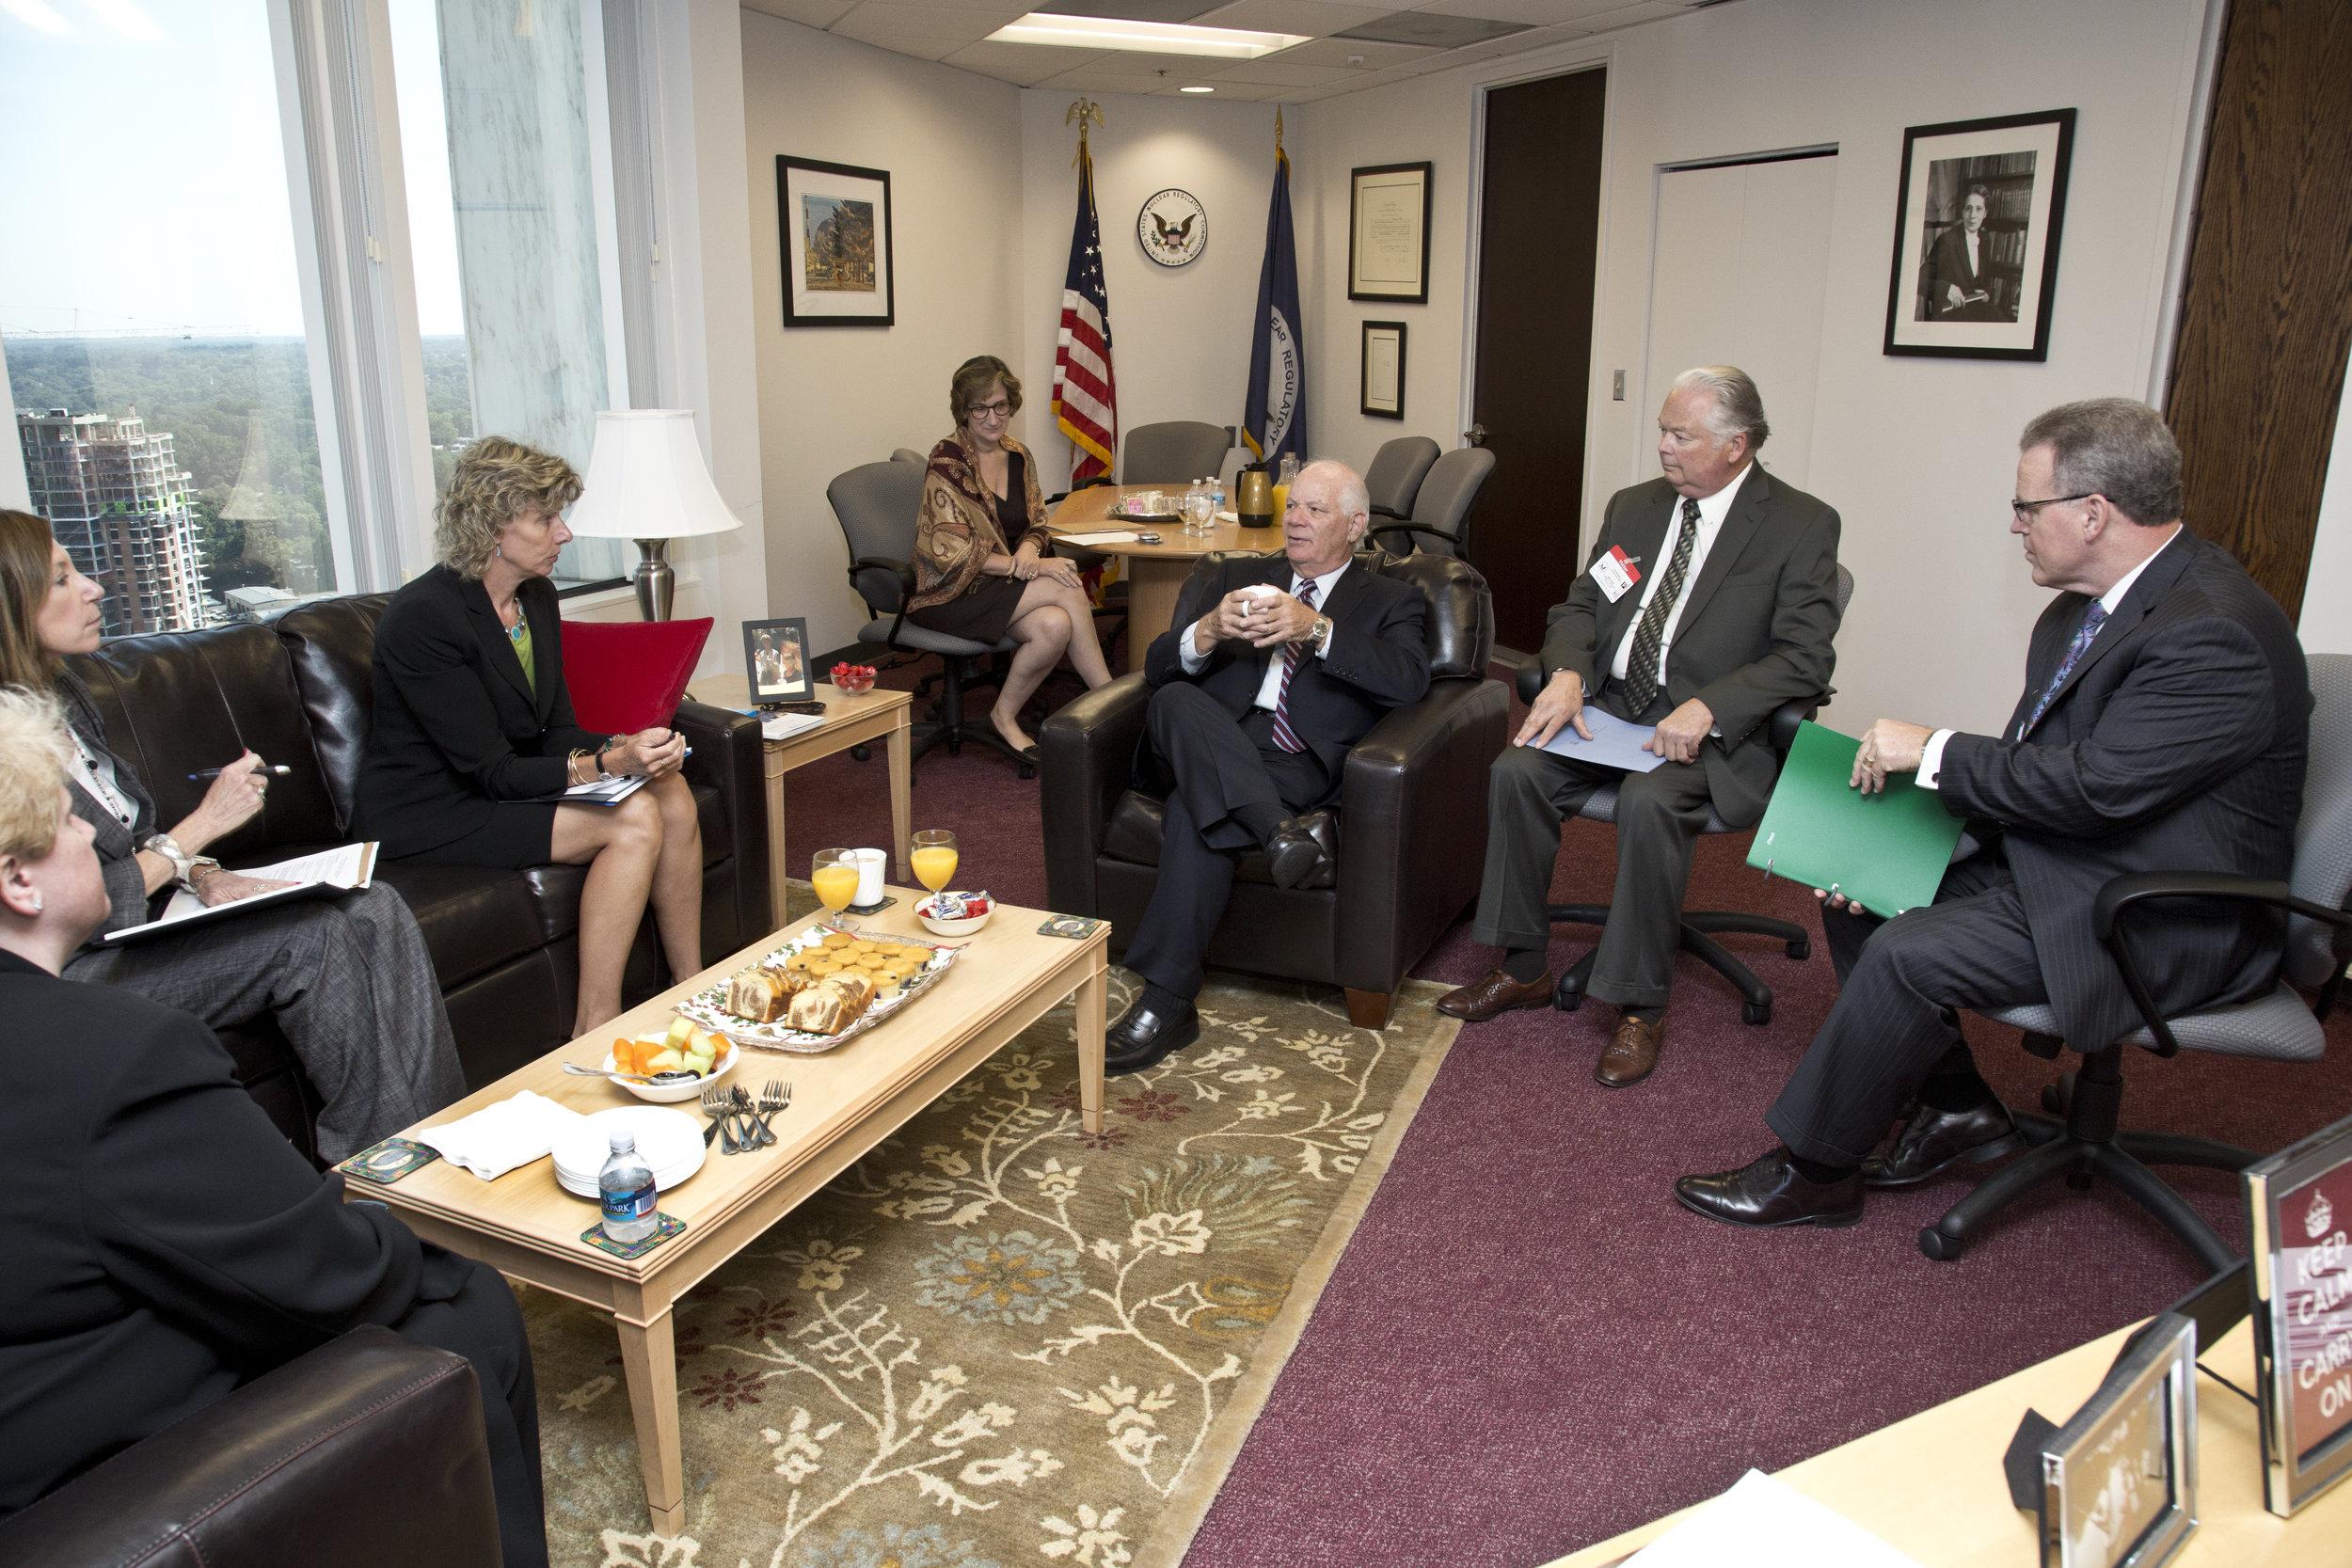 2013 08 United States Senator Ben Cardin Visits the NRC03108262013.jpg